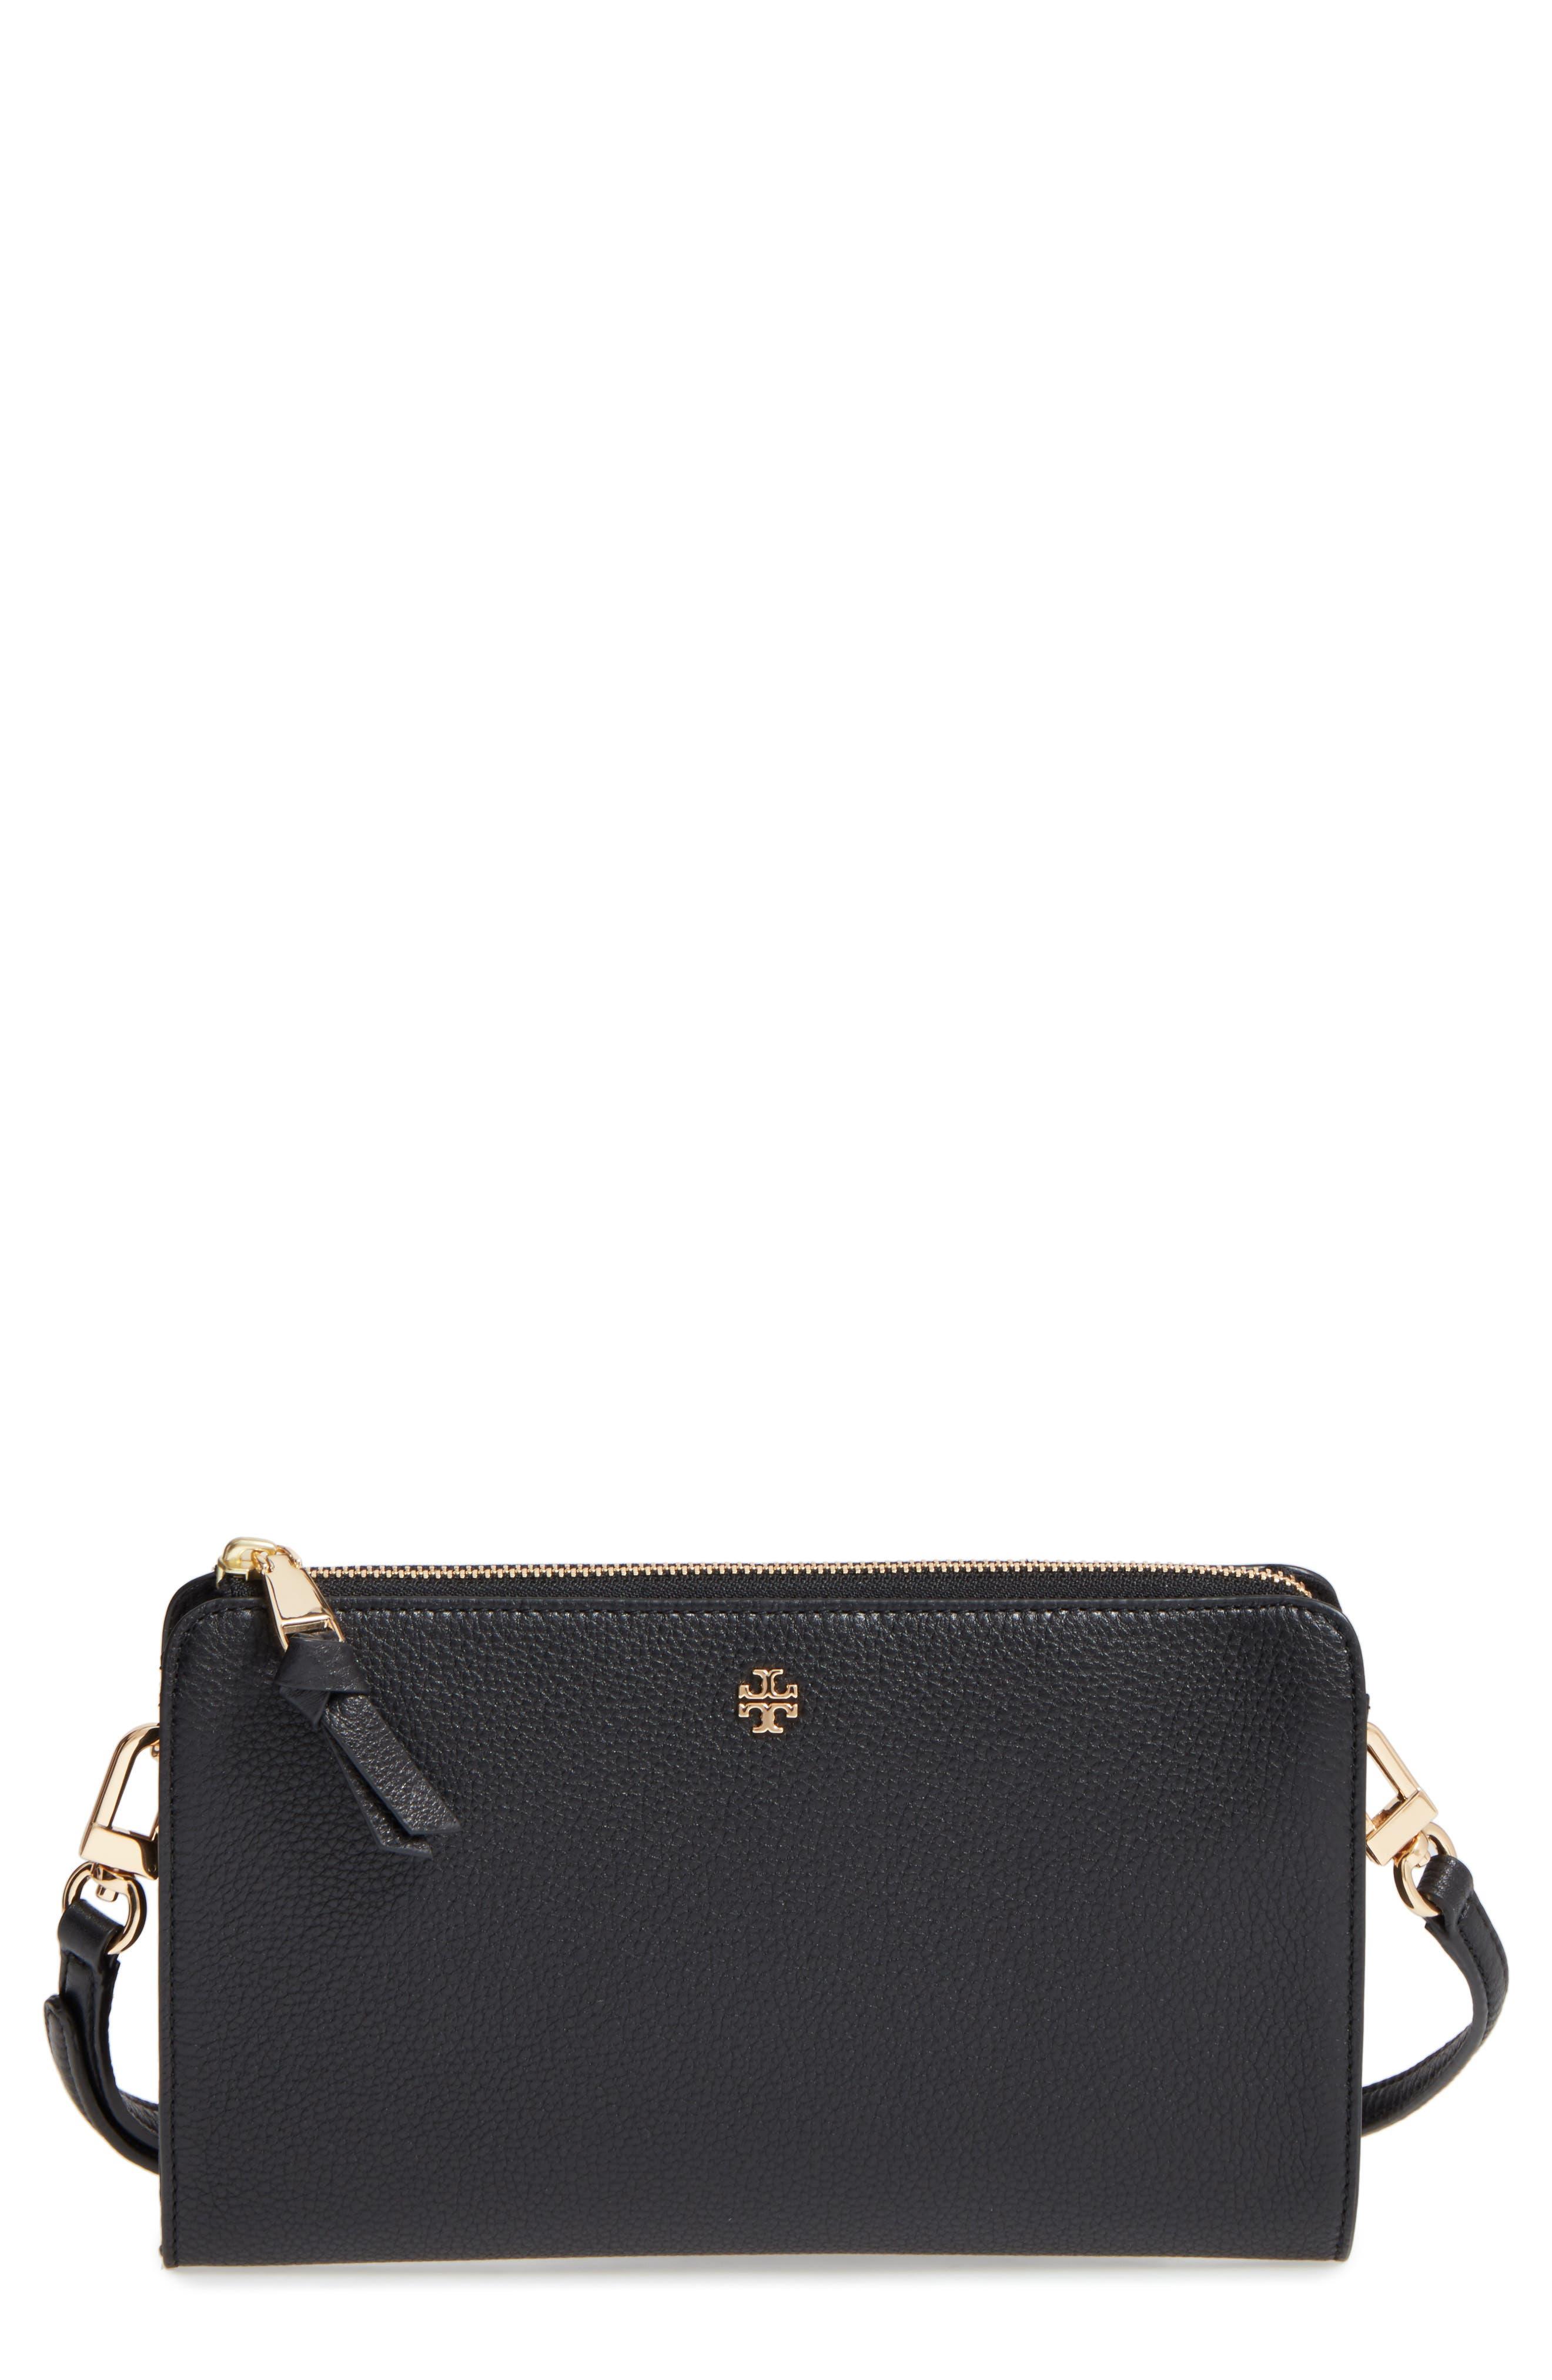 e2d7e0f7d340 ... top quality tory burch robinson leather wallet crossbody bag 72633 9c648